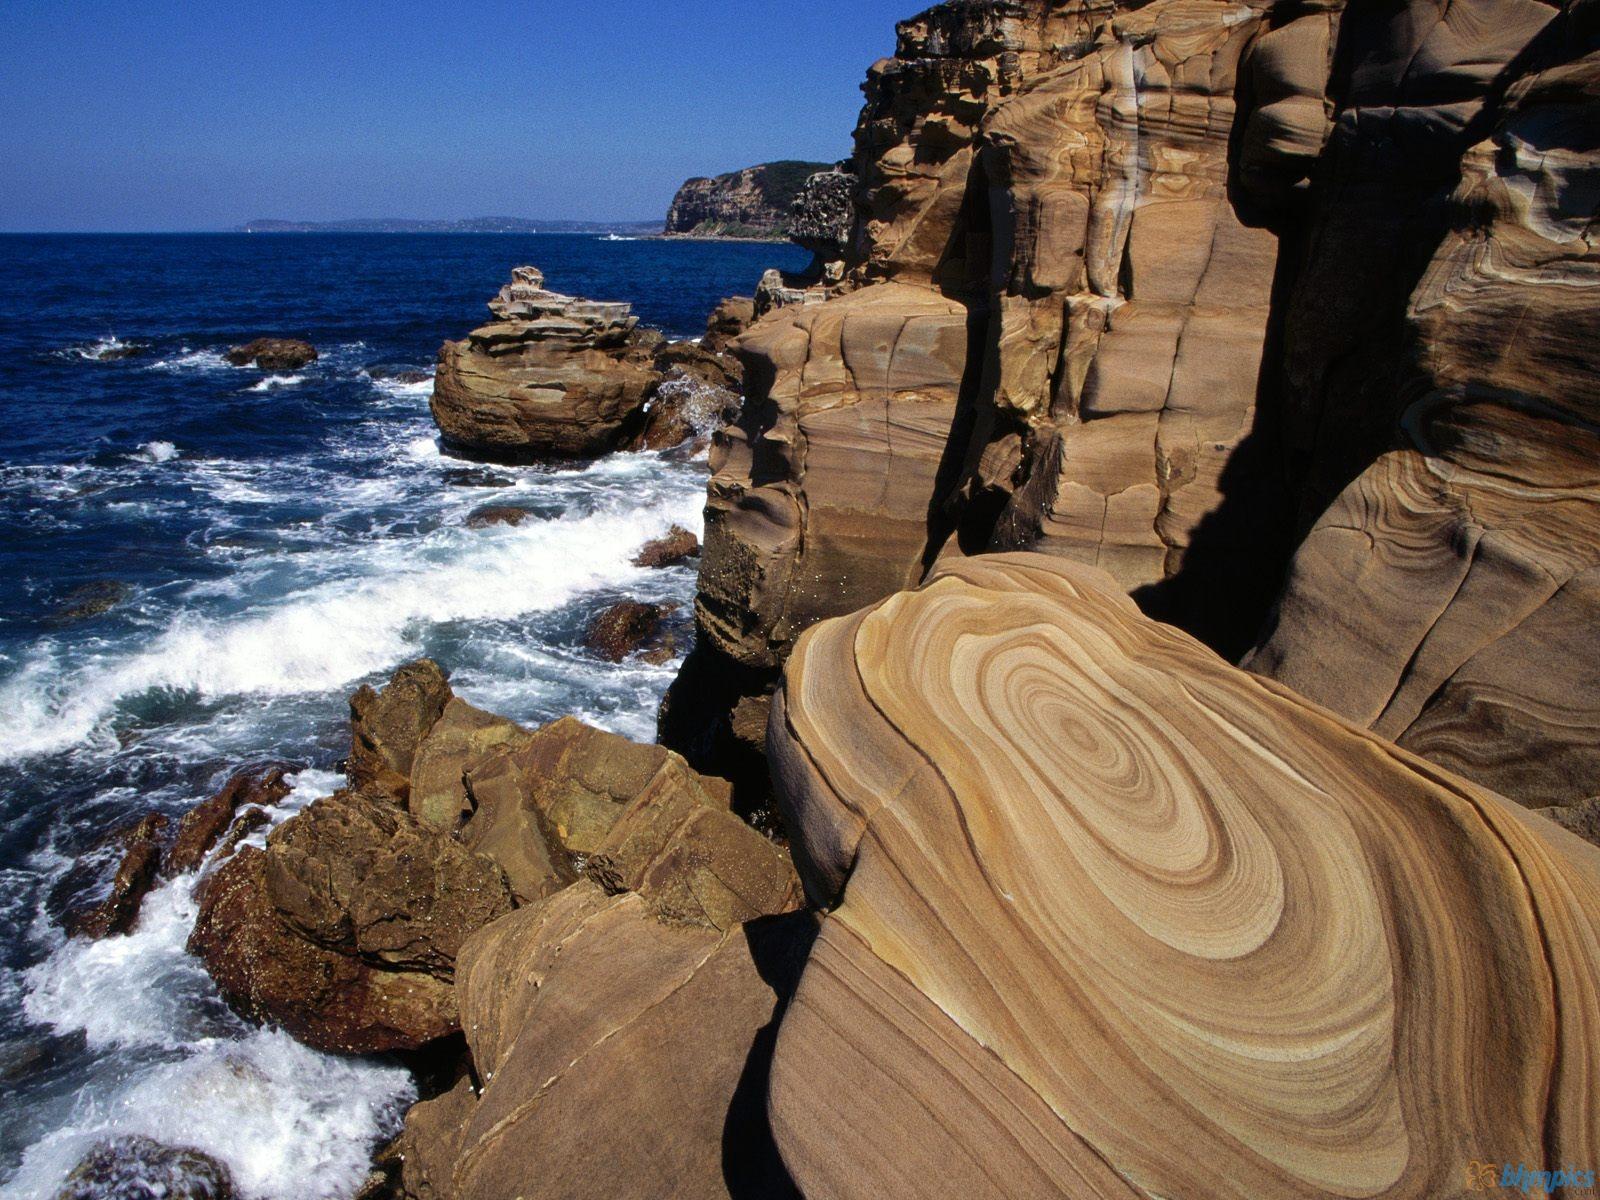 Australia HD Wallpapers Bouddinationalparkaustr